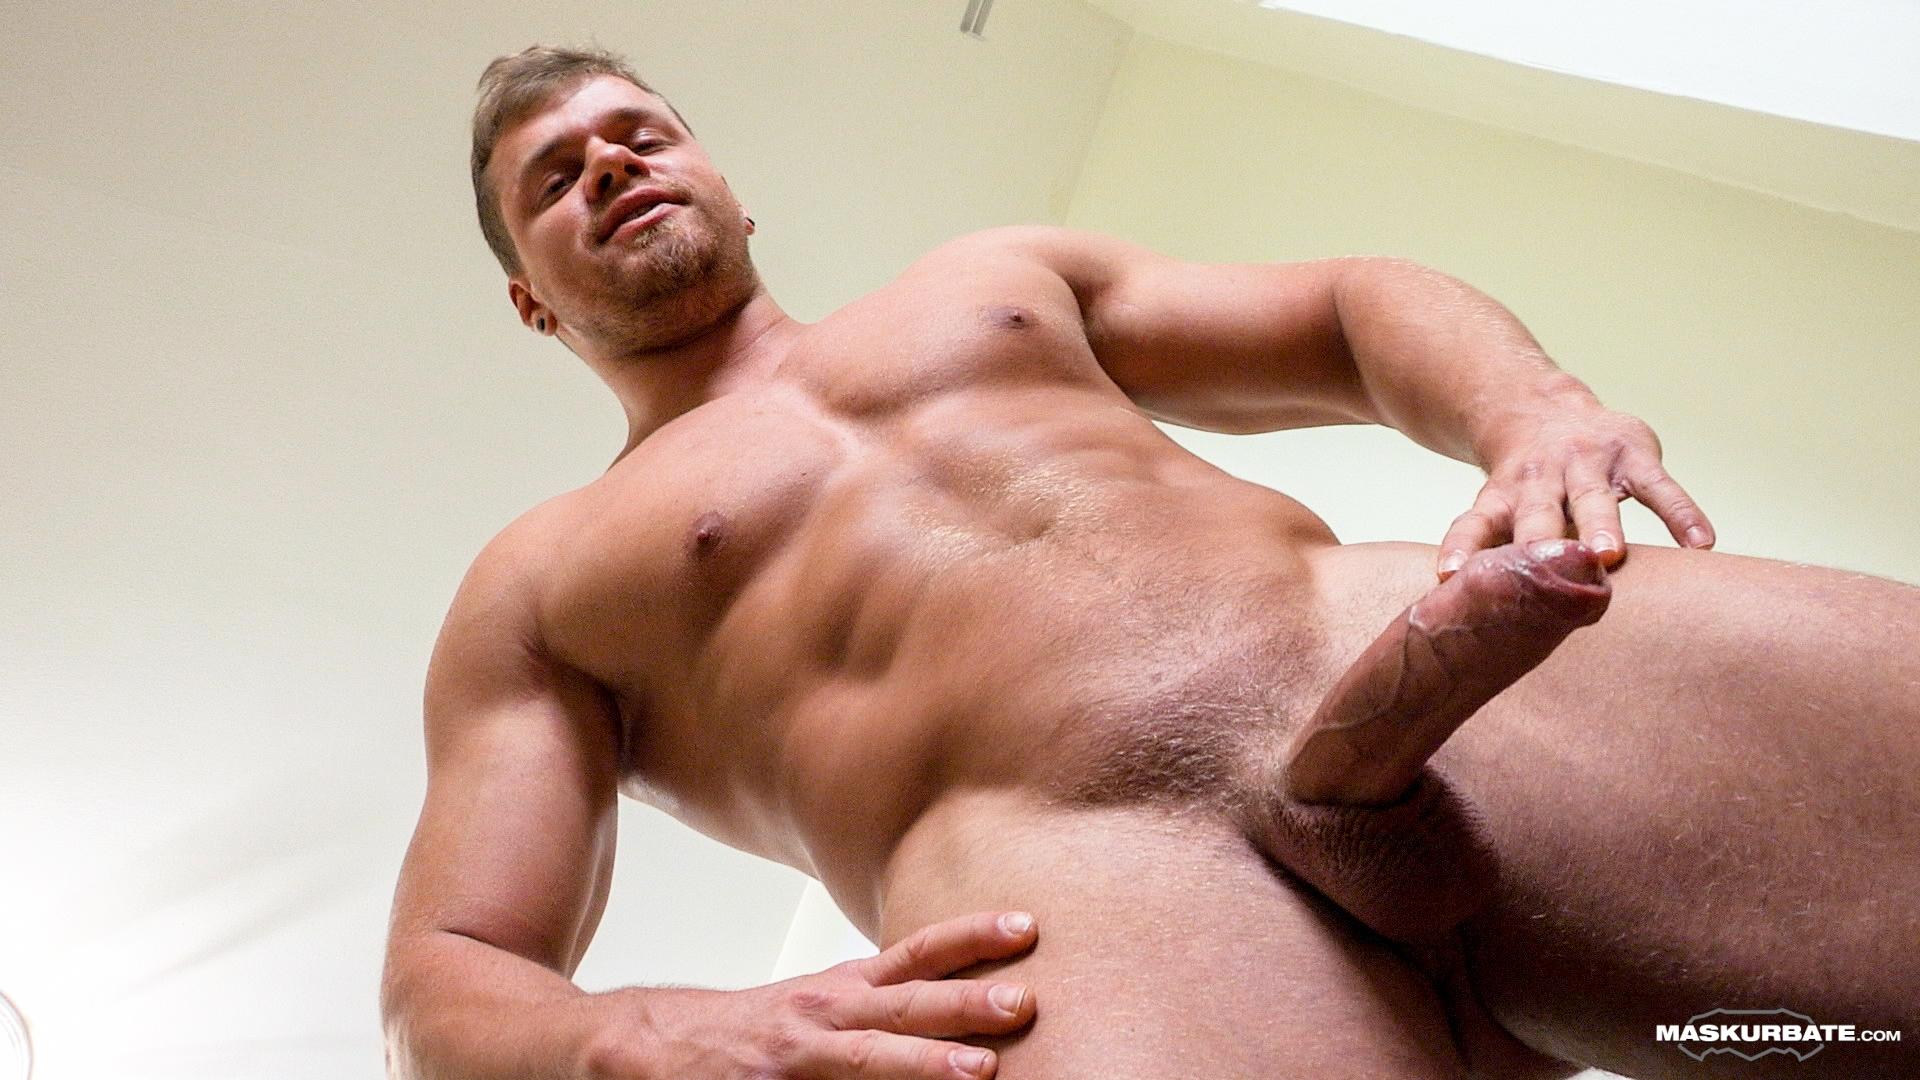 Brad, Bigger He Cums 2